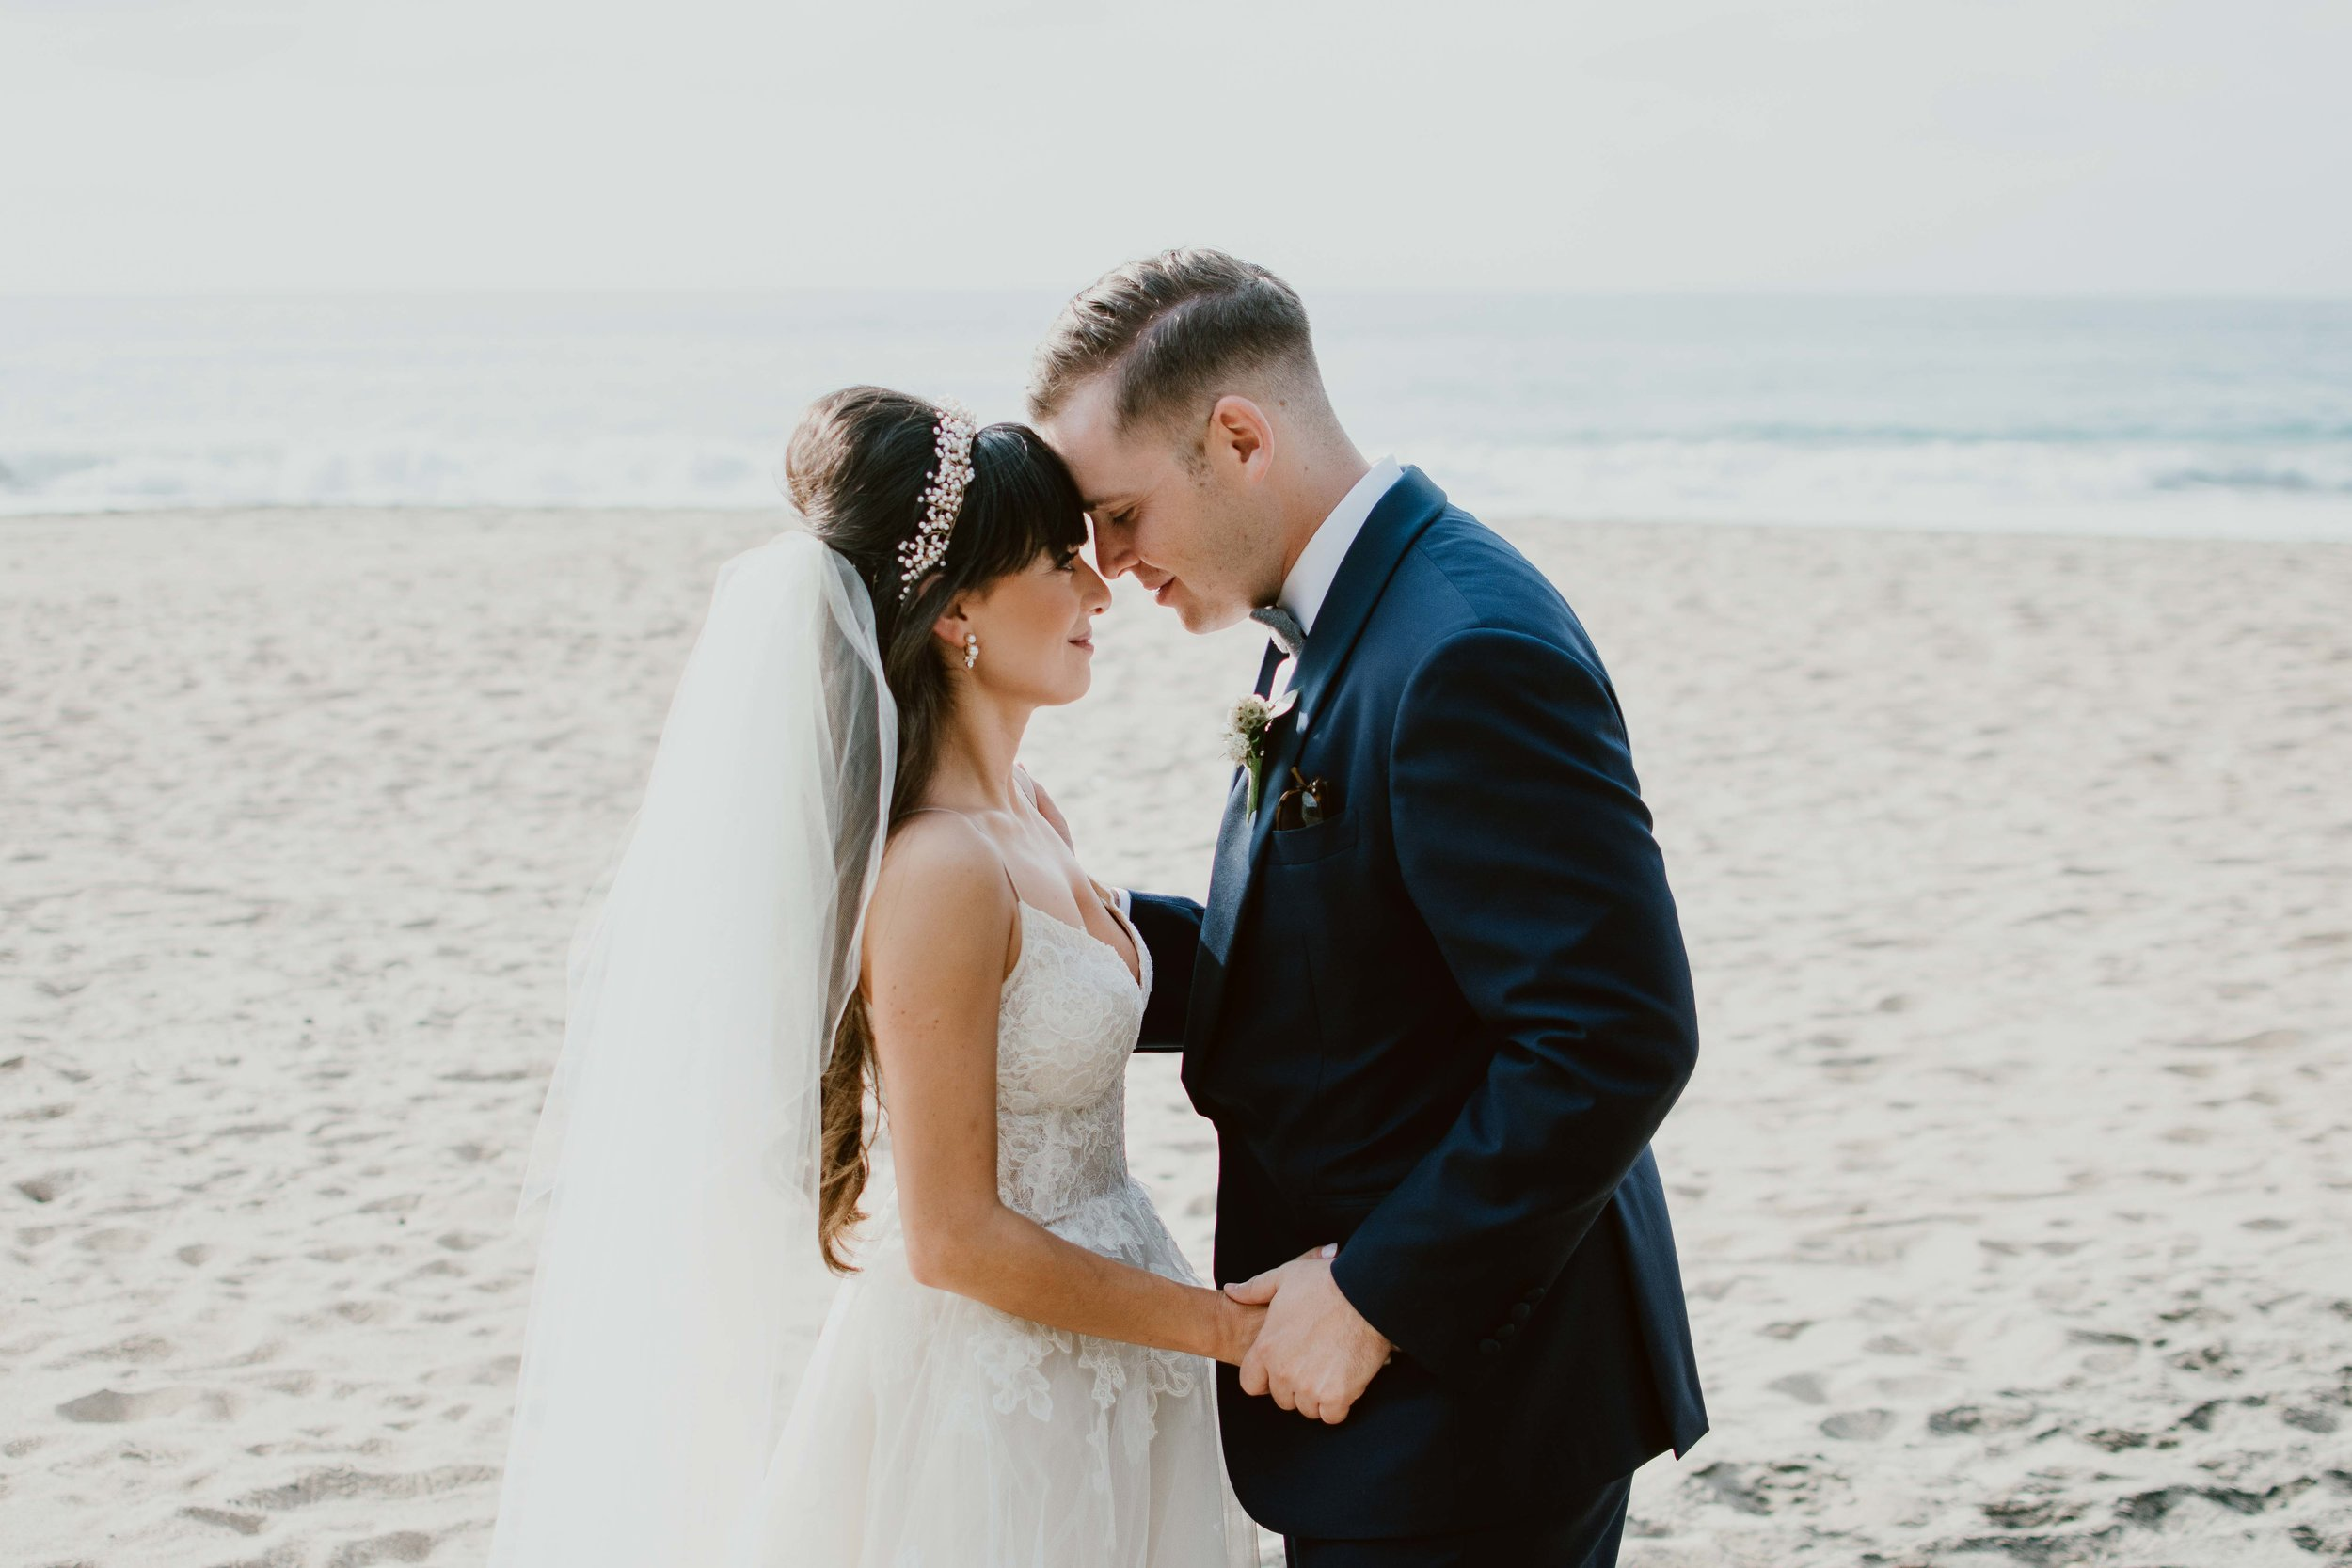 Mariana+Blake Sayulita Wedding-212.jpg